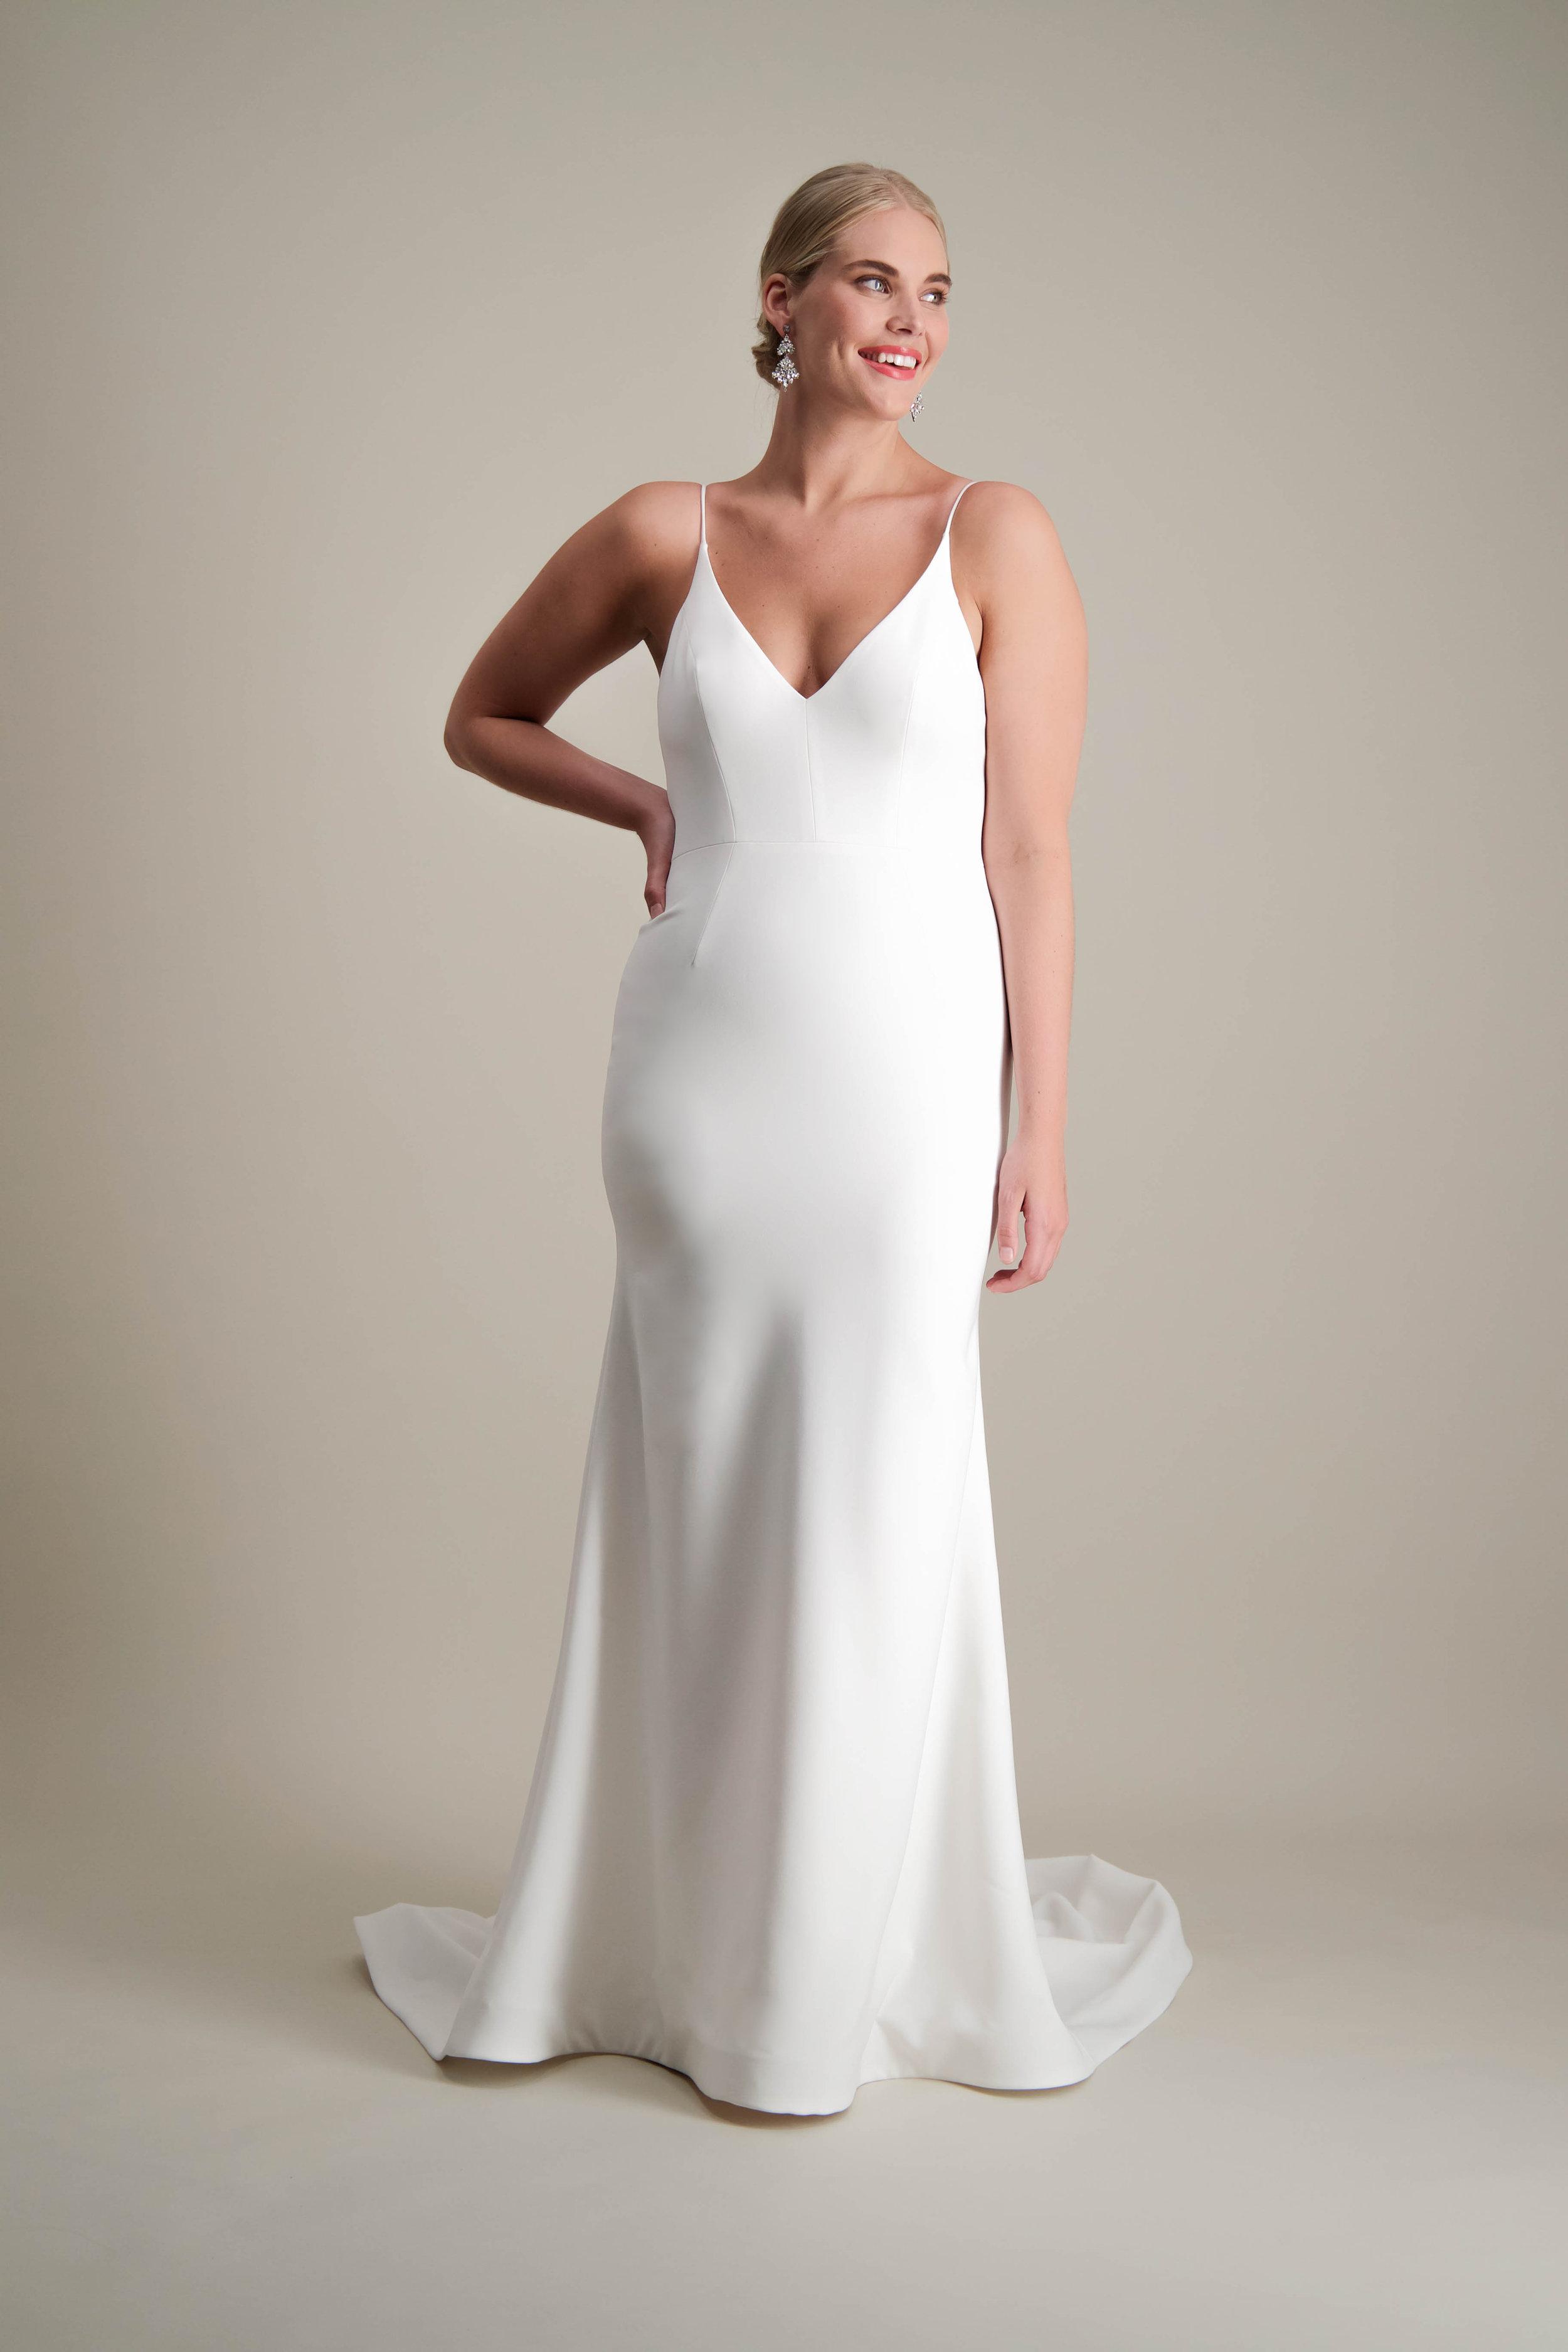 Islet gown fitted modern sleek wedding dress 4.jpg